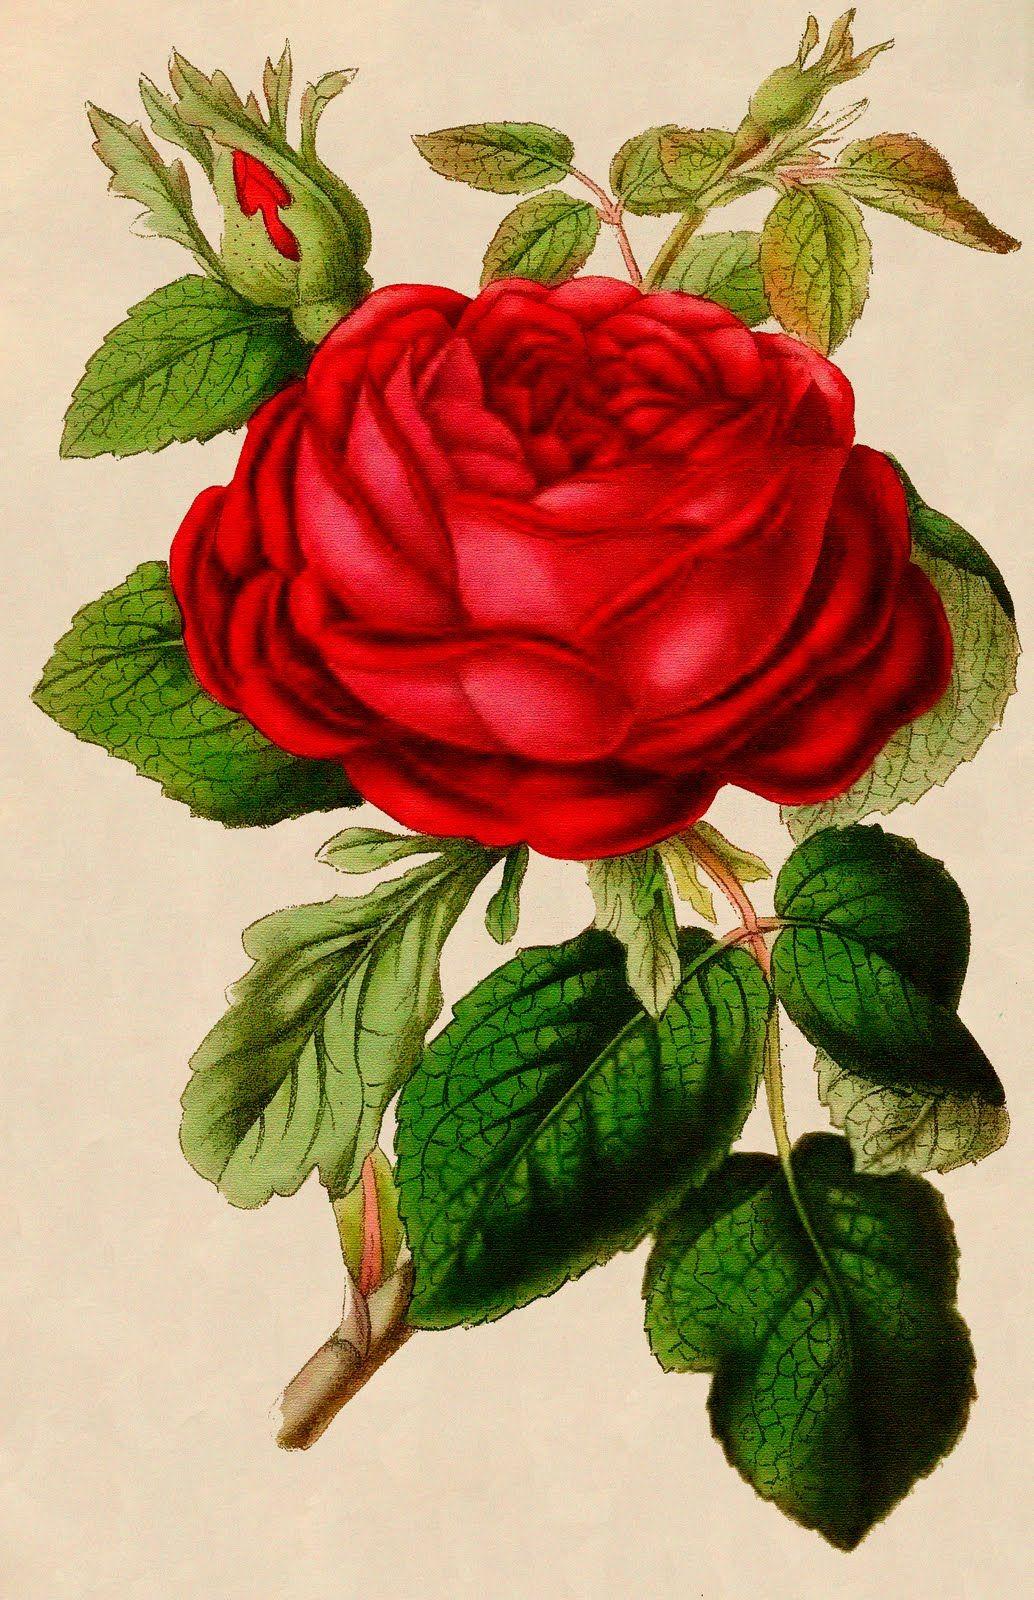 vintage graphic beautiful red rose vintage graphic. Black Bedroom Furniture Sets. Home Design Ideas